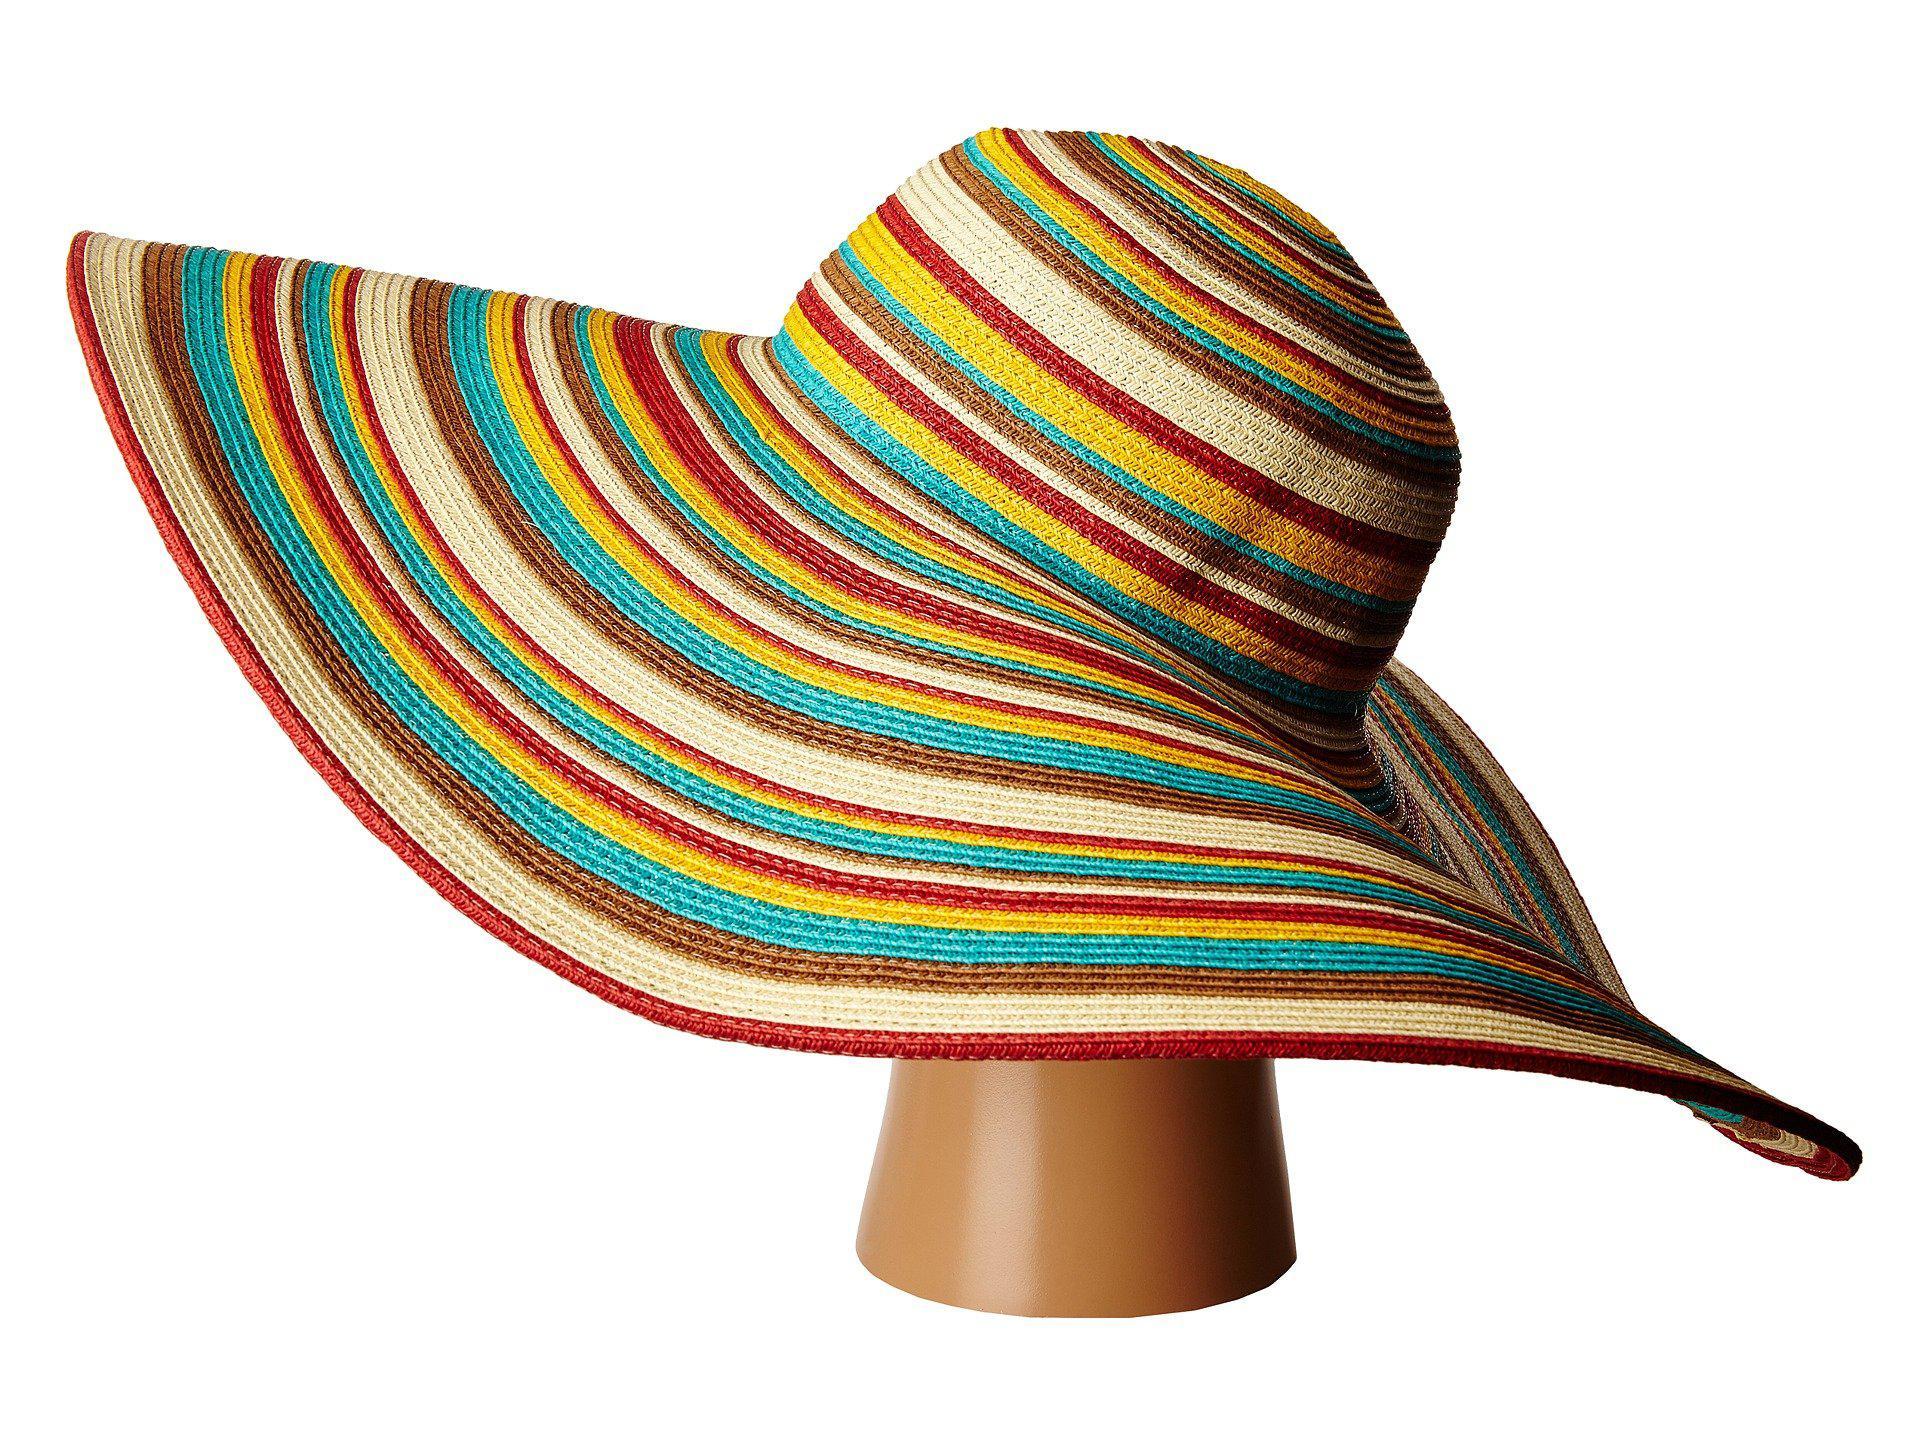 027242f9b8b02 San Diego Hat Company - Brown Ubx2721 Striped Floppy 8 Inch Brim Sun Hat  (multi. View fullscreen